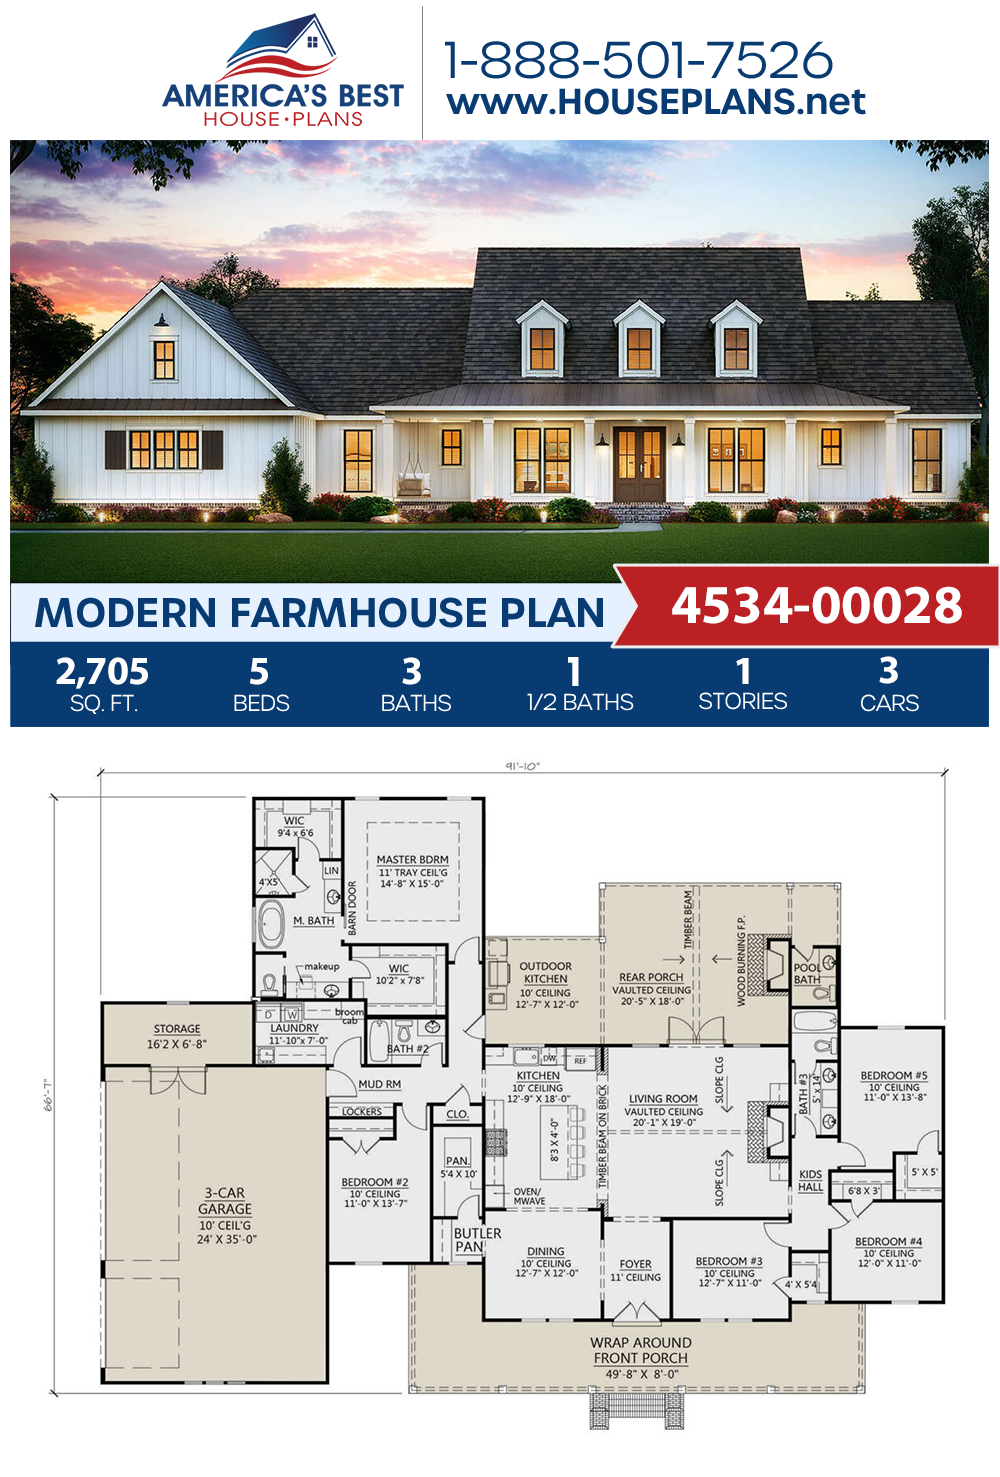 House Plan 4534 00028 Modern Farmhouse Plan 2 705 Square Feet 5 Bedrooms 3 5 Bathrooms Modern Farmhouse Plans House Blueprints Craftsman House Plans